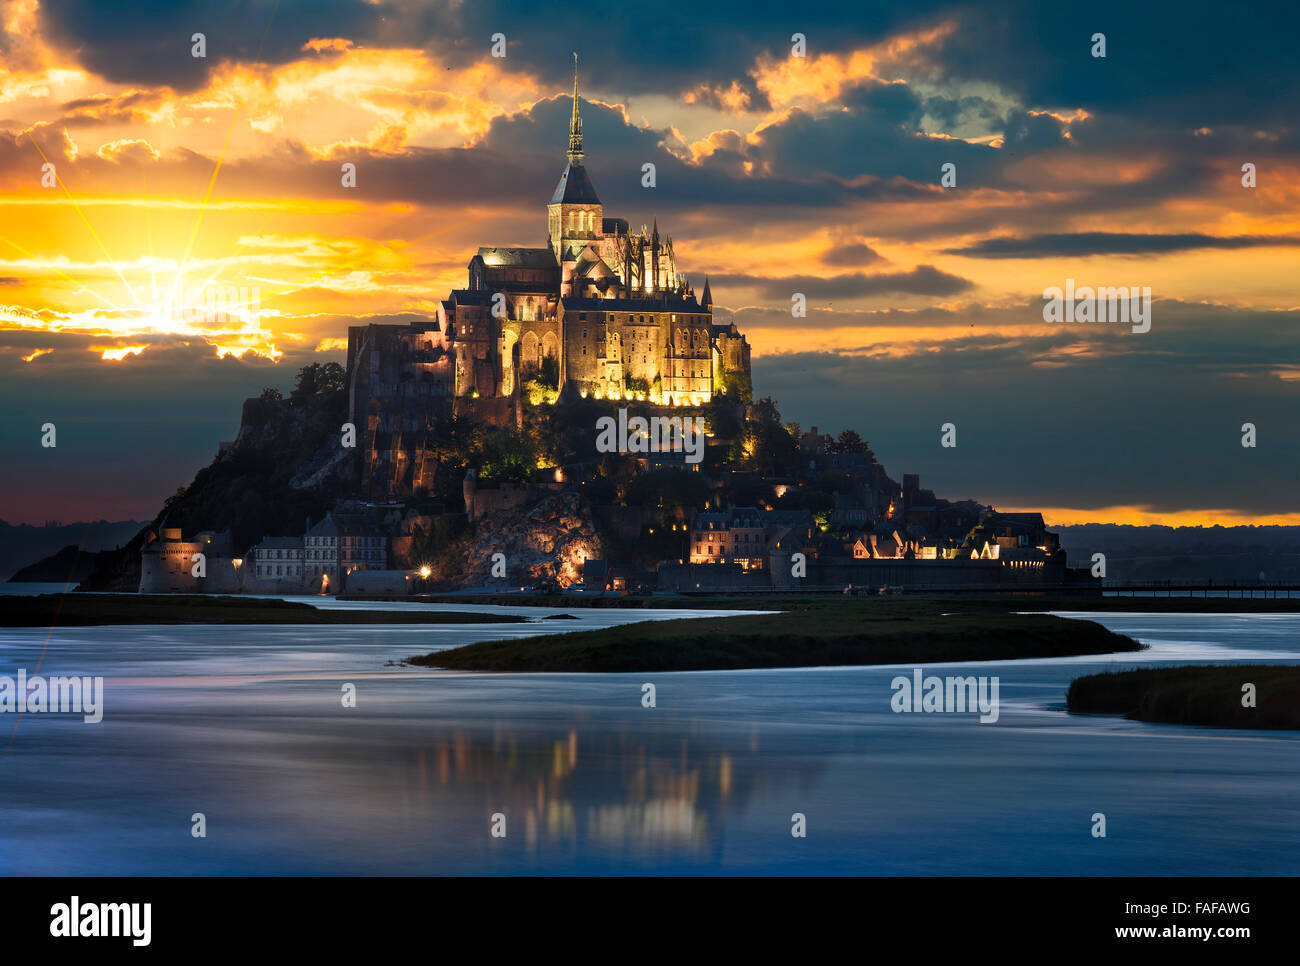 Le Mont Saint-Michel bei Sonnenuntergang, Normandie, Bretagne, Frankreich, Europa Stockbild